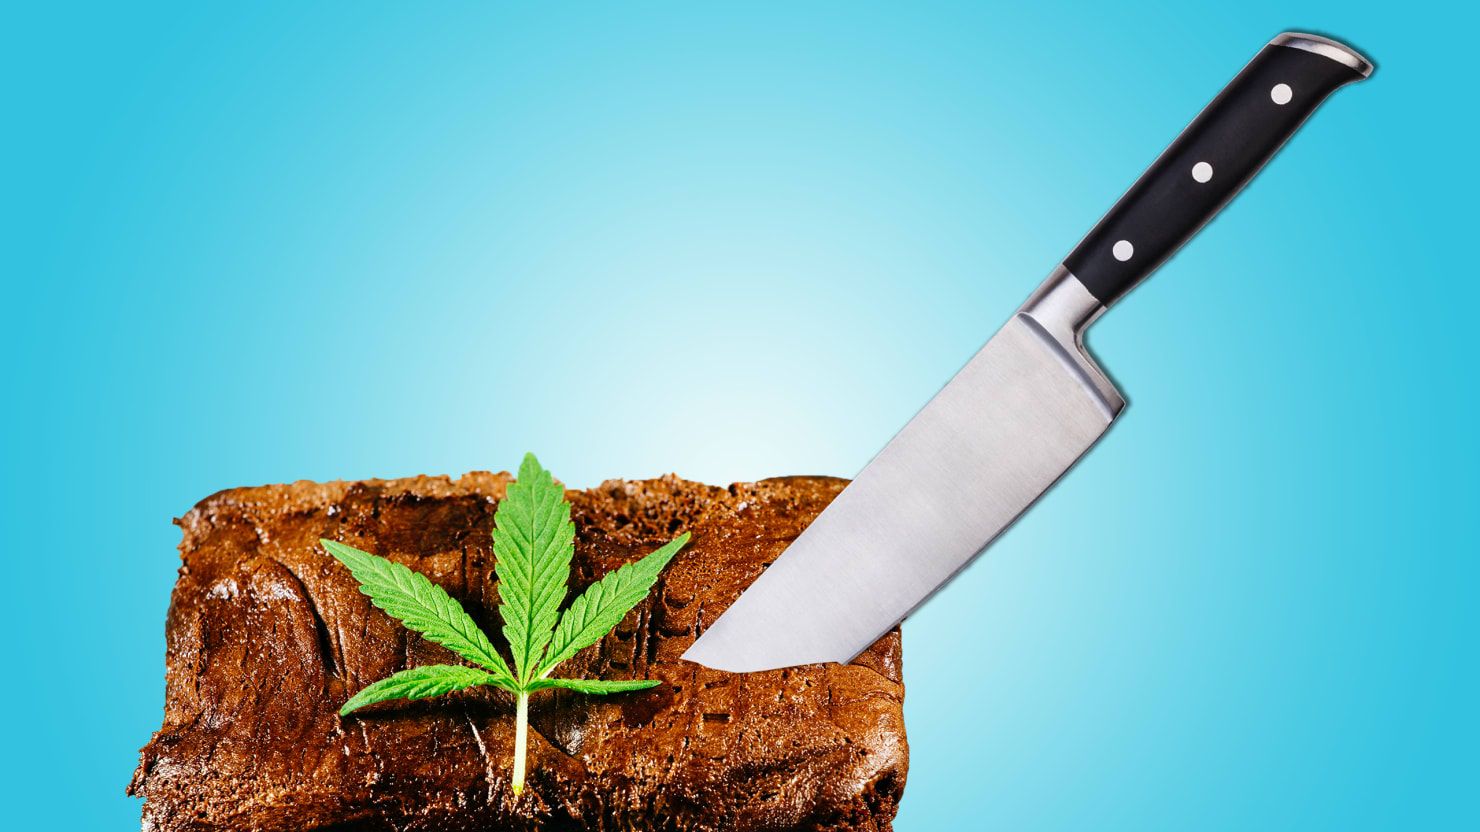 The New Murder Defense: Marijuana Made Me Do It